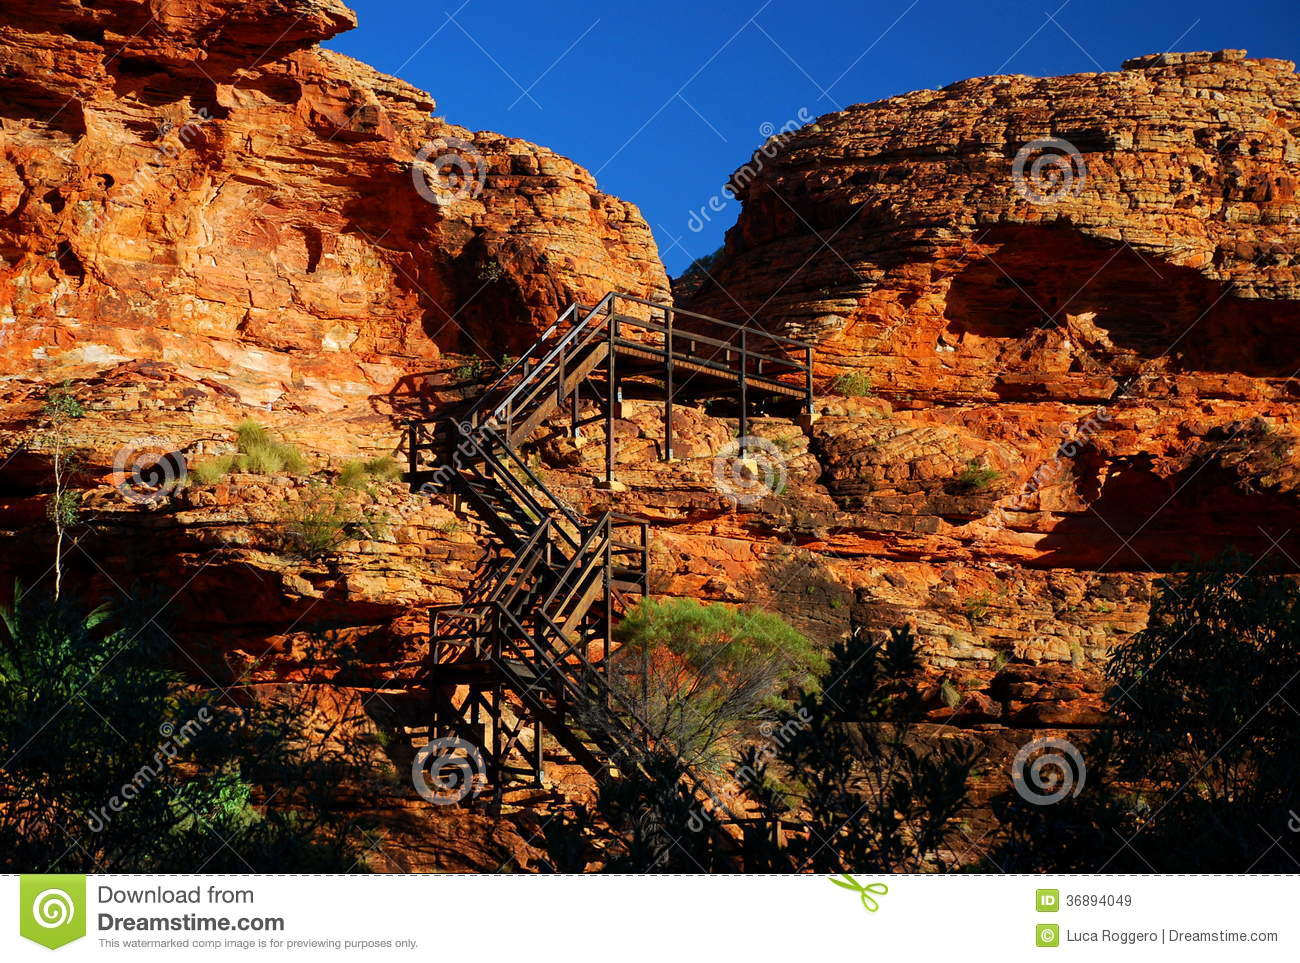 Kings Canyon Dome. Watarrka National Park, Northern Territory.